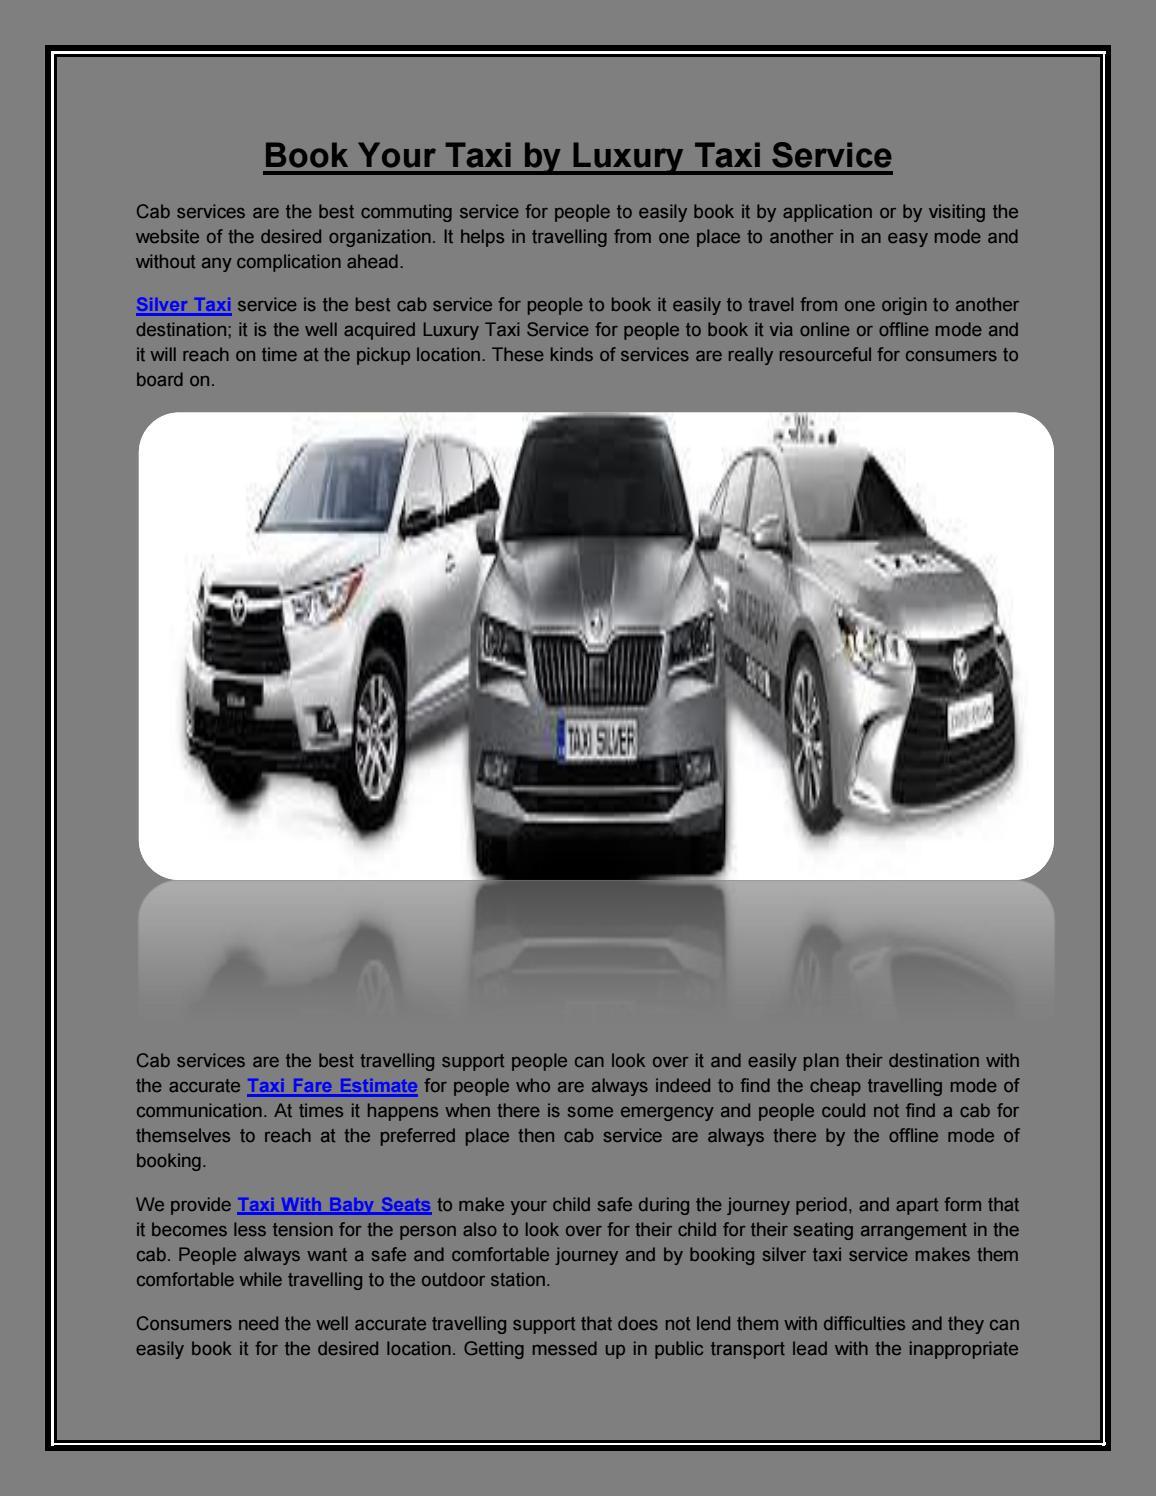 Silver Taxi | Taxi Fare Estimate | Luxury Taxi Service | Taxi With